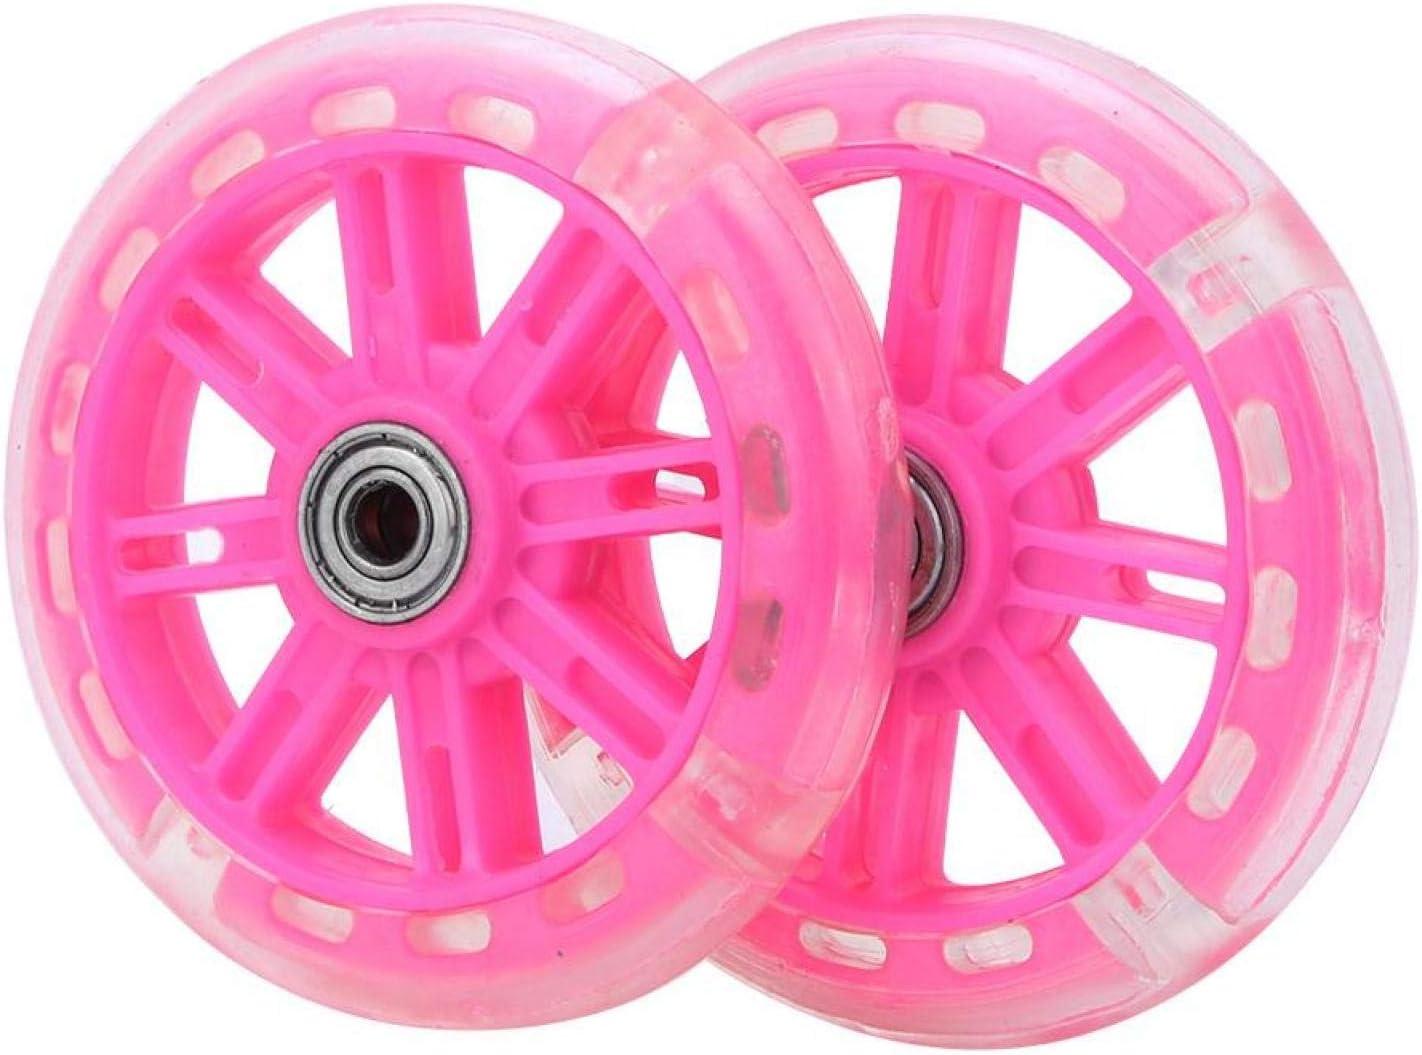 Outlet SALE Kids Bike Wheel Training High HalfHorizontal Popular products Stren Wheels